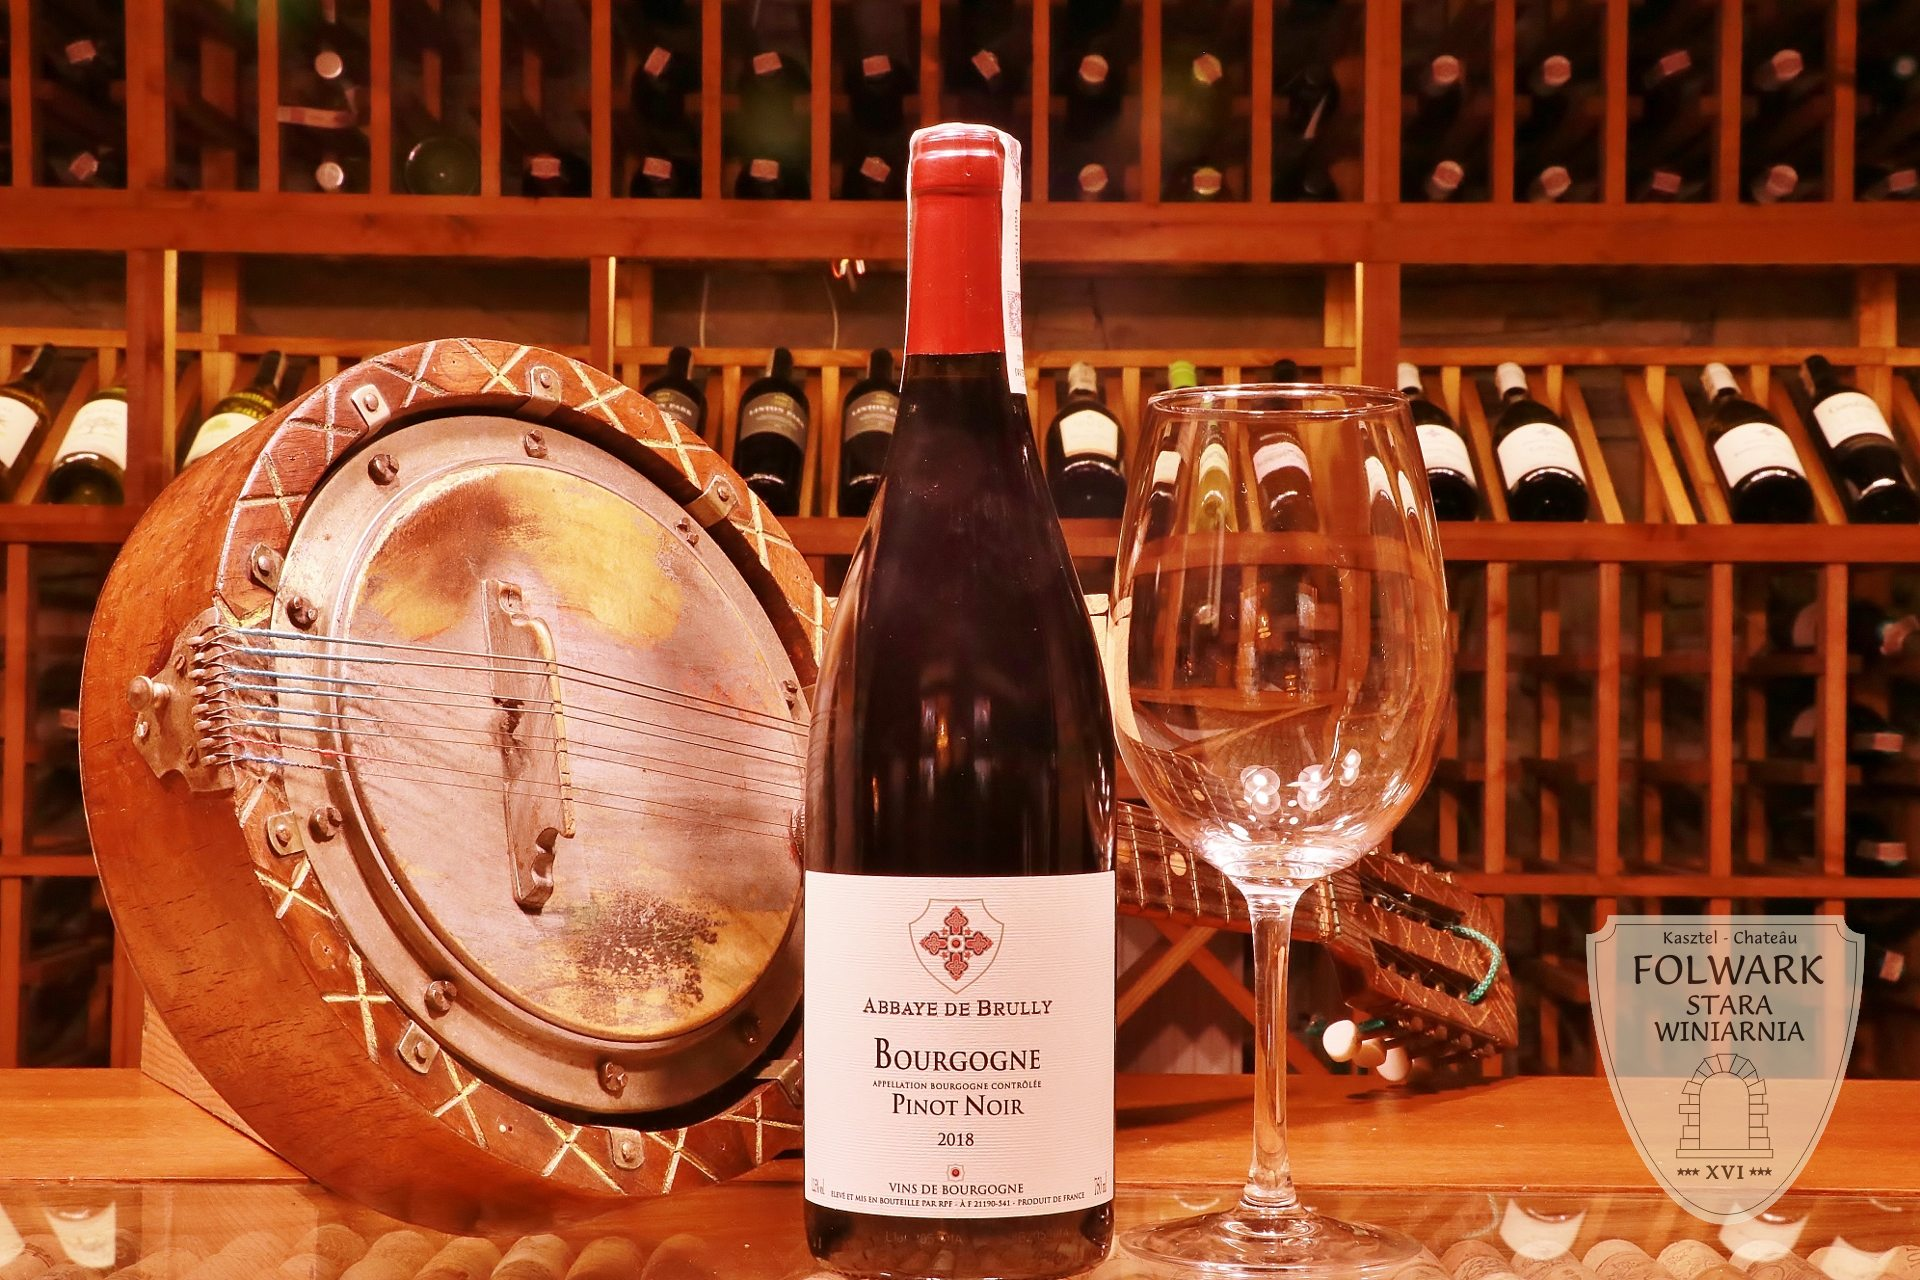 Abbaye de Brully Bourgogne Pinot Noir Francja lubimywino pl